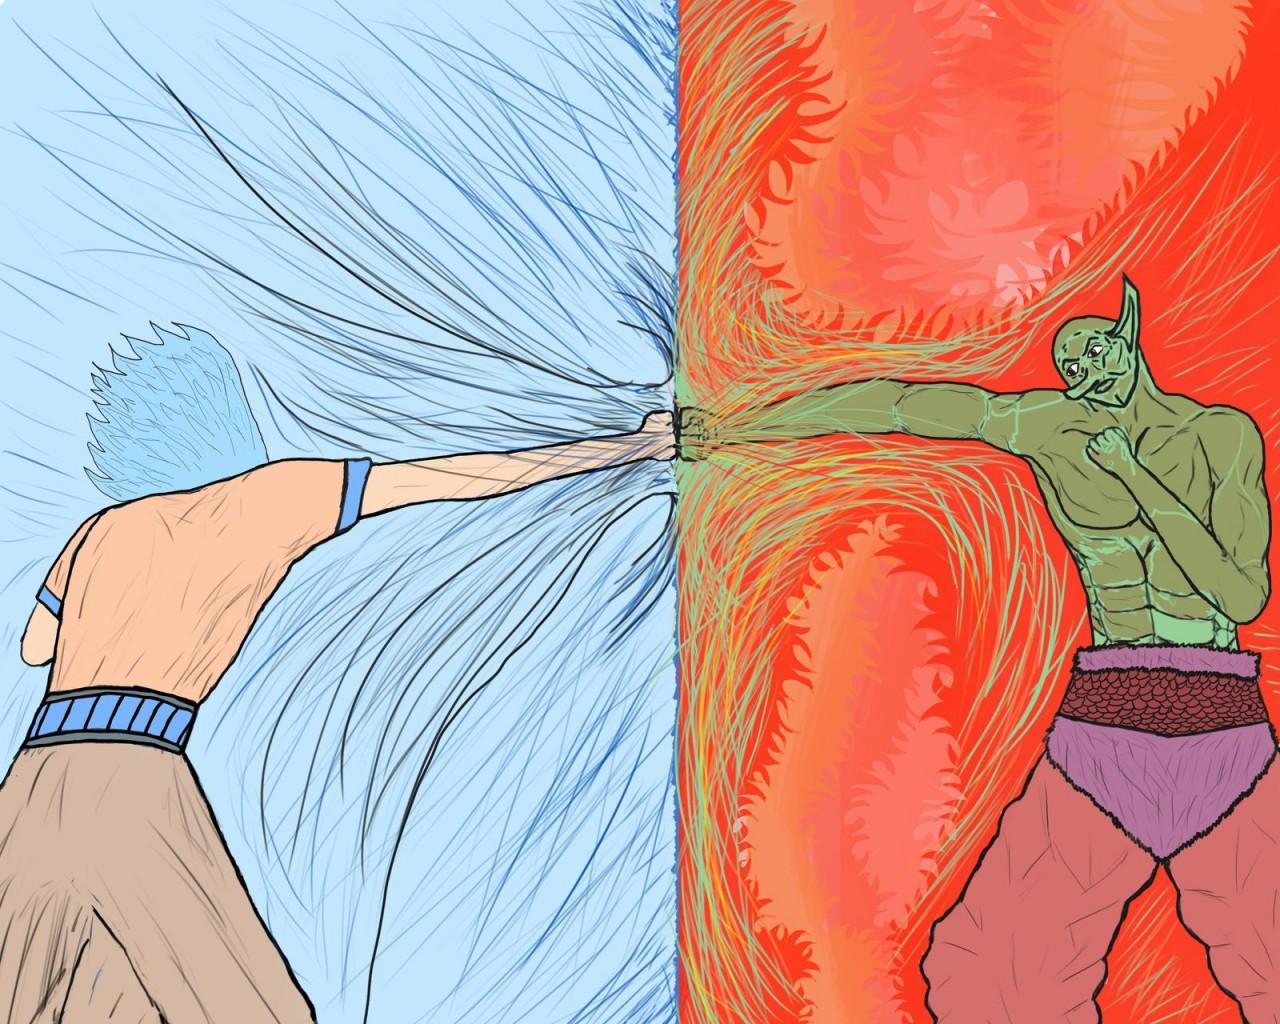 Poster Image for Ragnarok: Dawn of the Heavens' Massacre